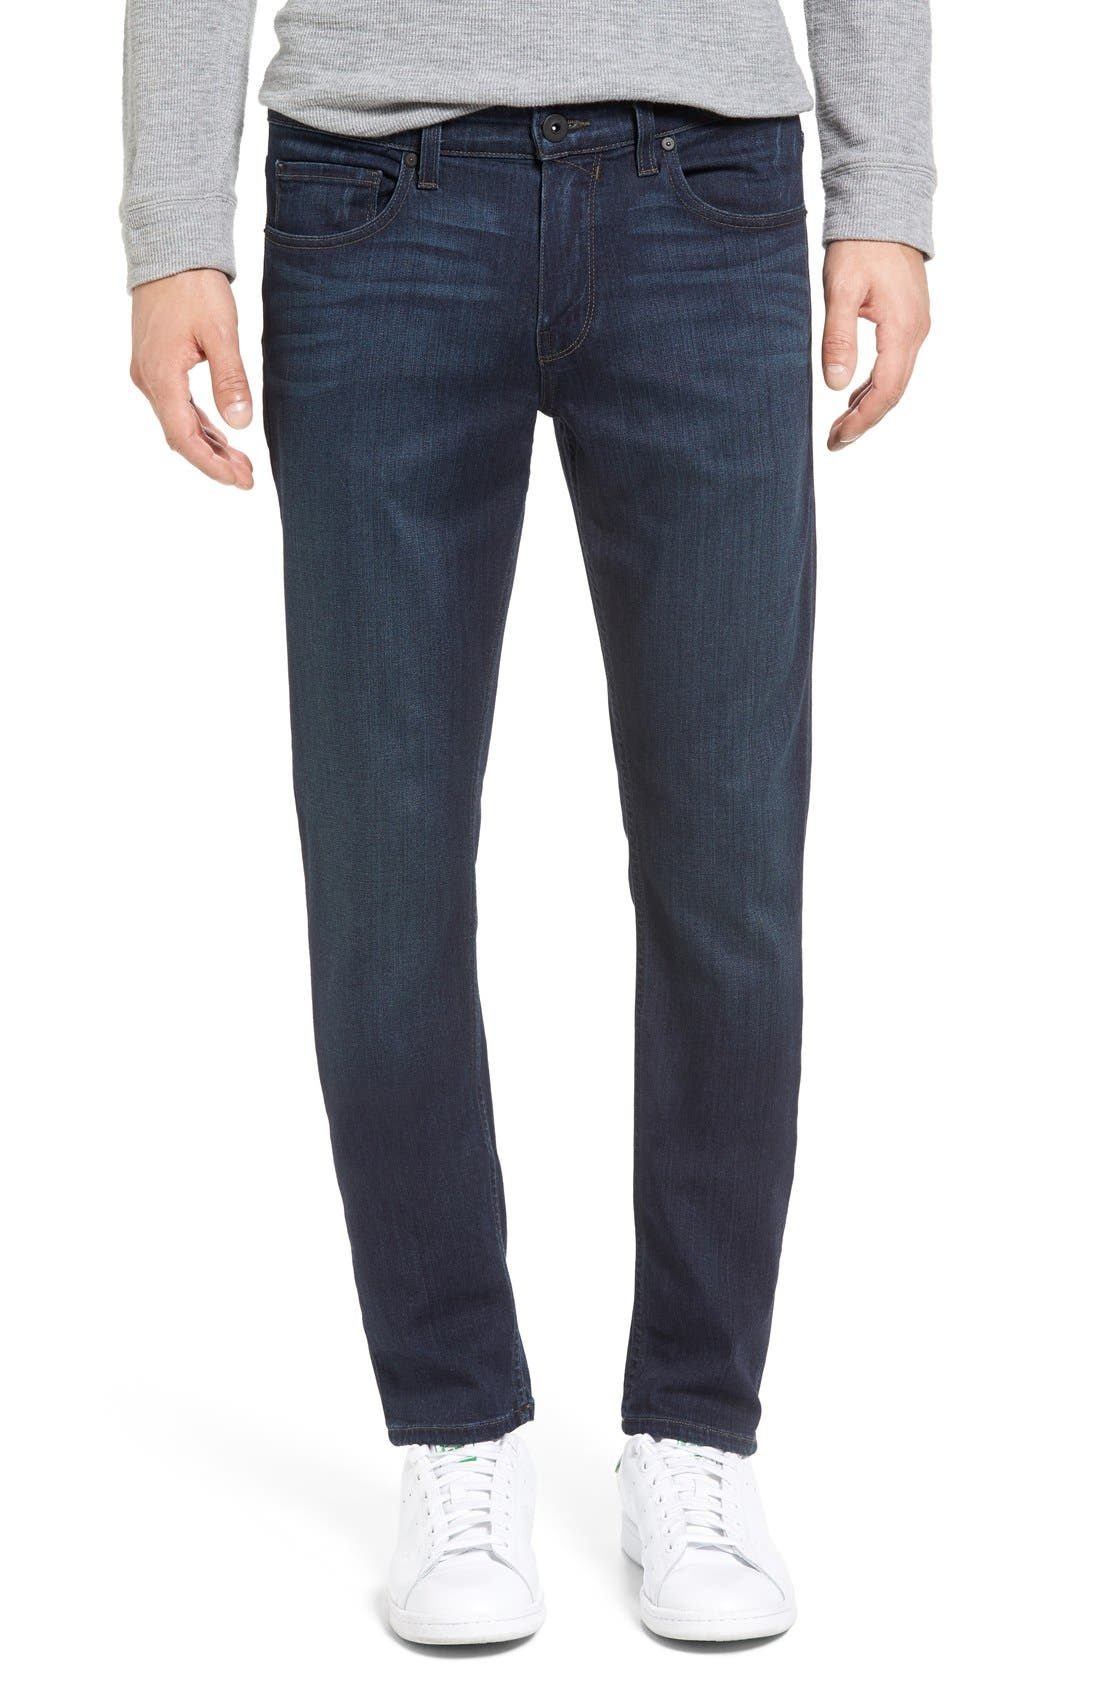 PAIGE Croft TRANSCEND Skinny Fit Jeans